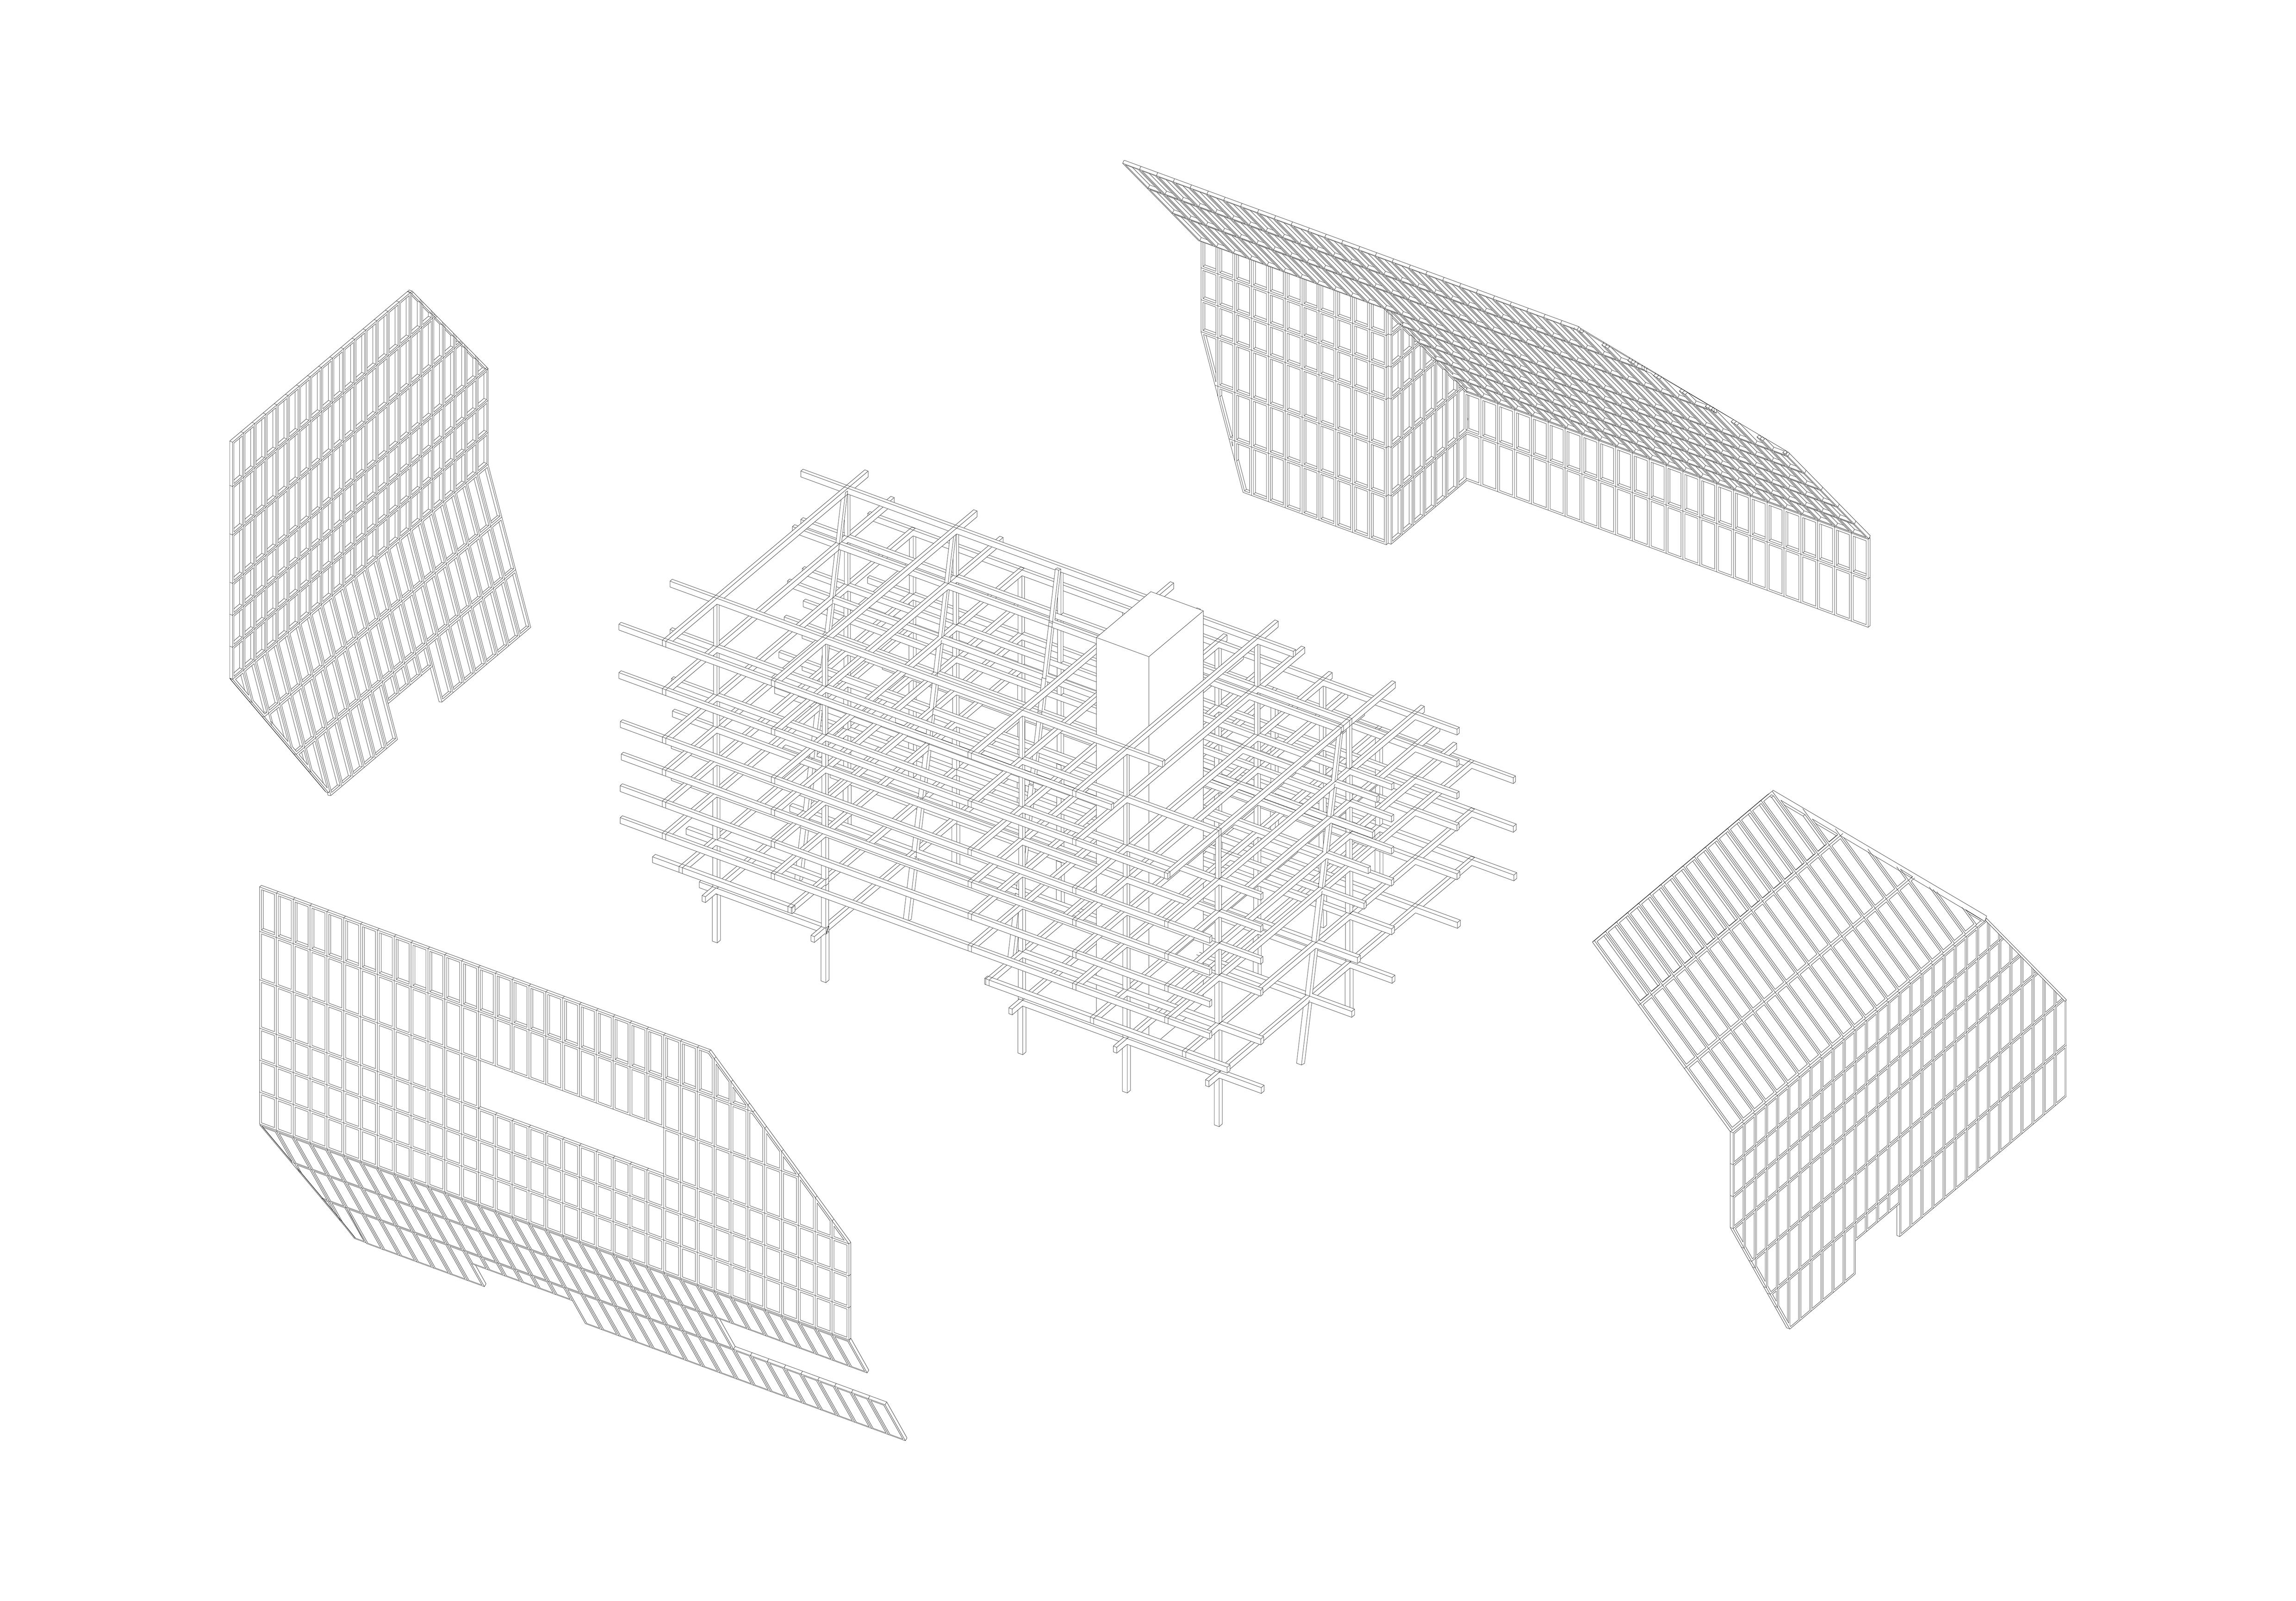 Axono structure